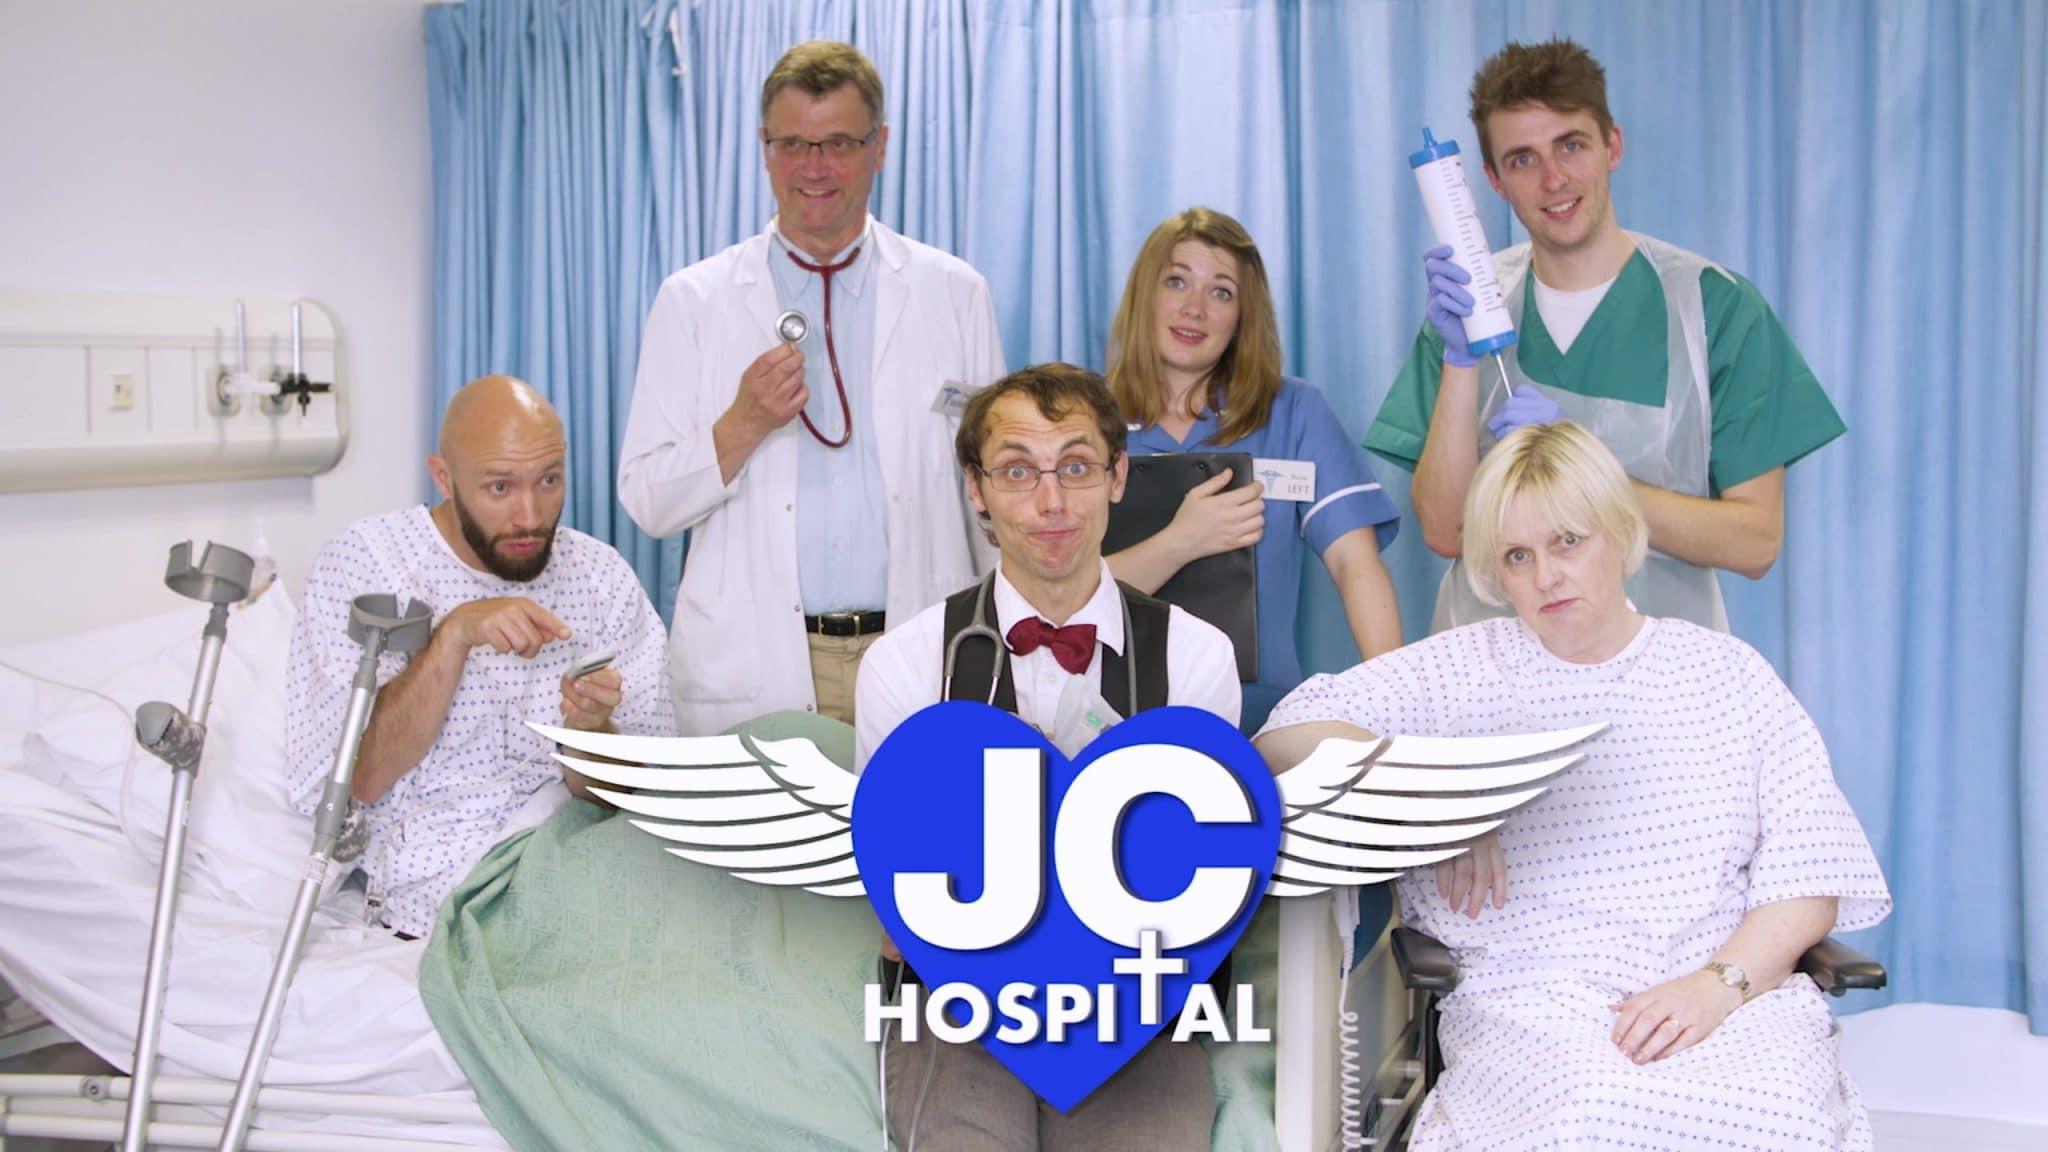 JC Hospital Series